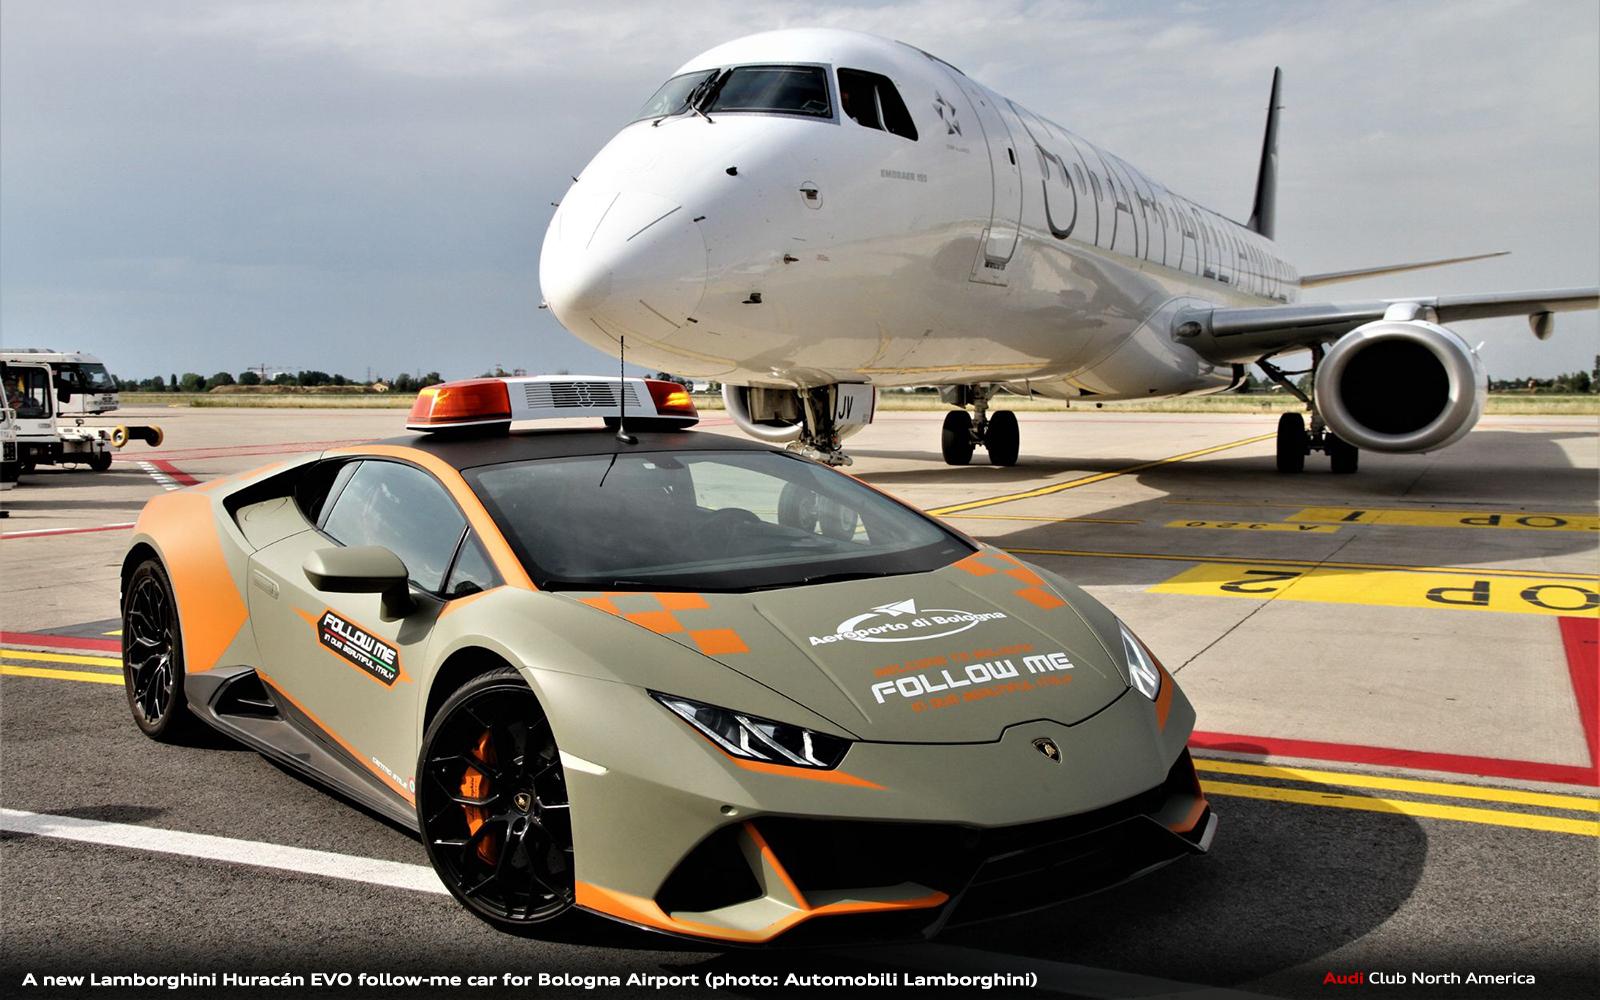 A New Lamborghini Huracán EVO Follow-Me Car for Bologna Airport